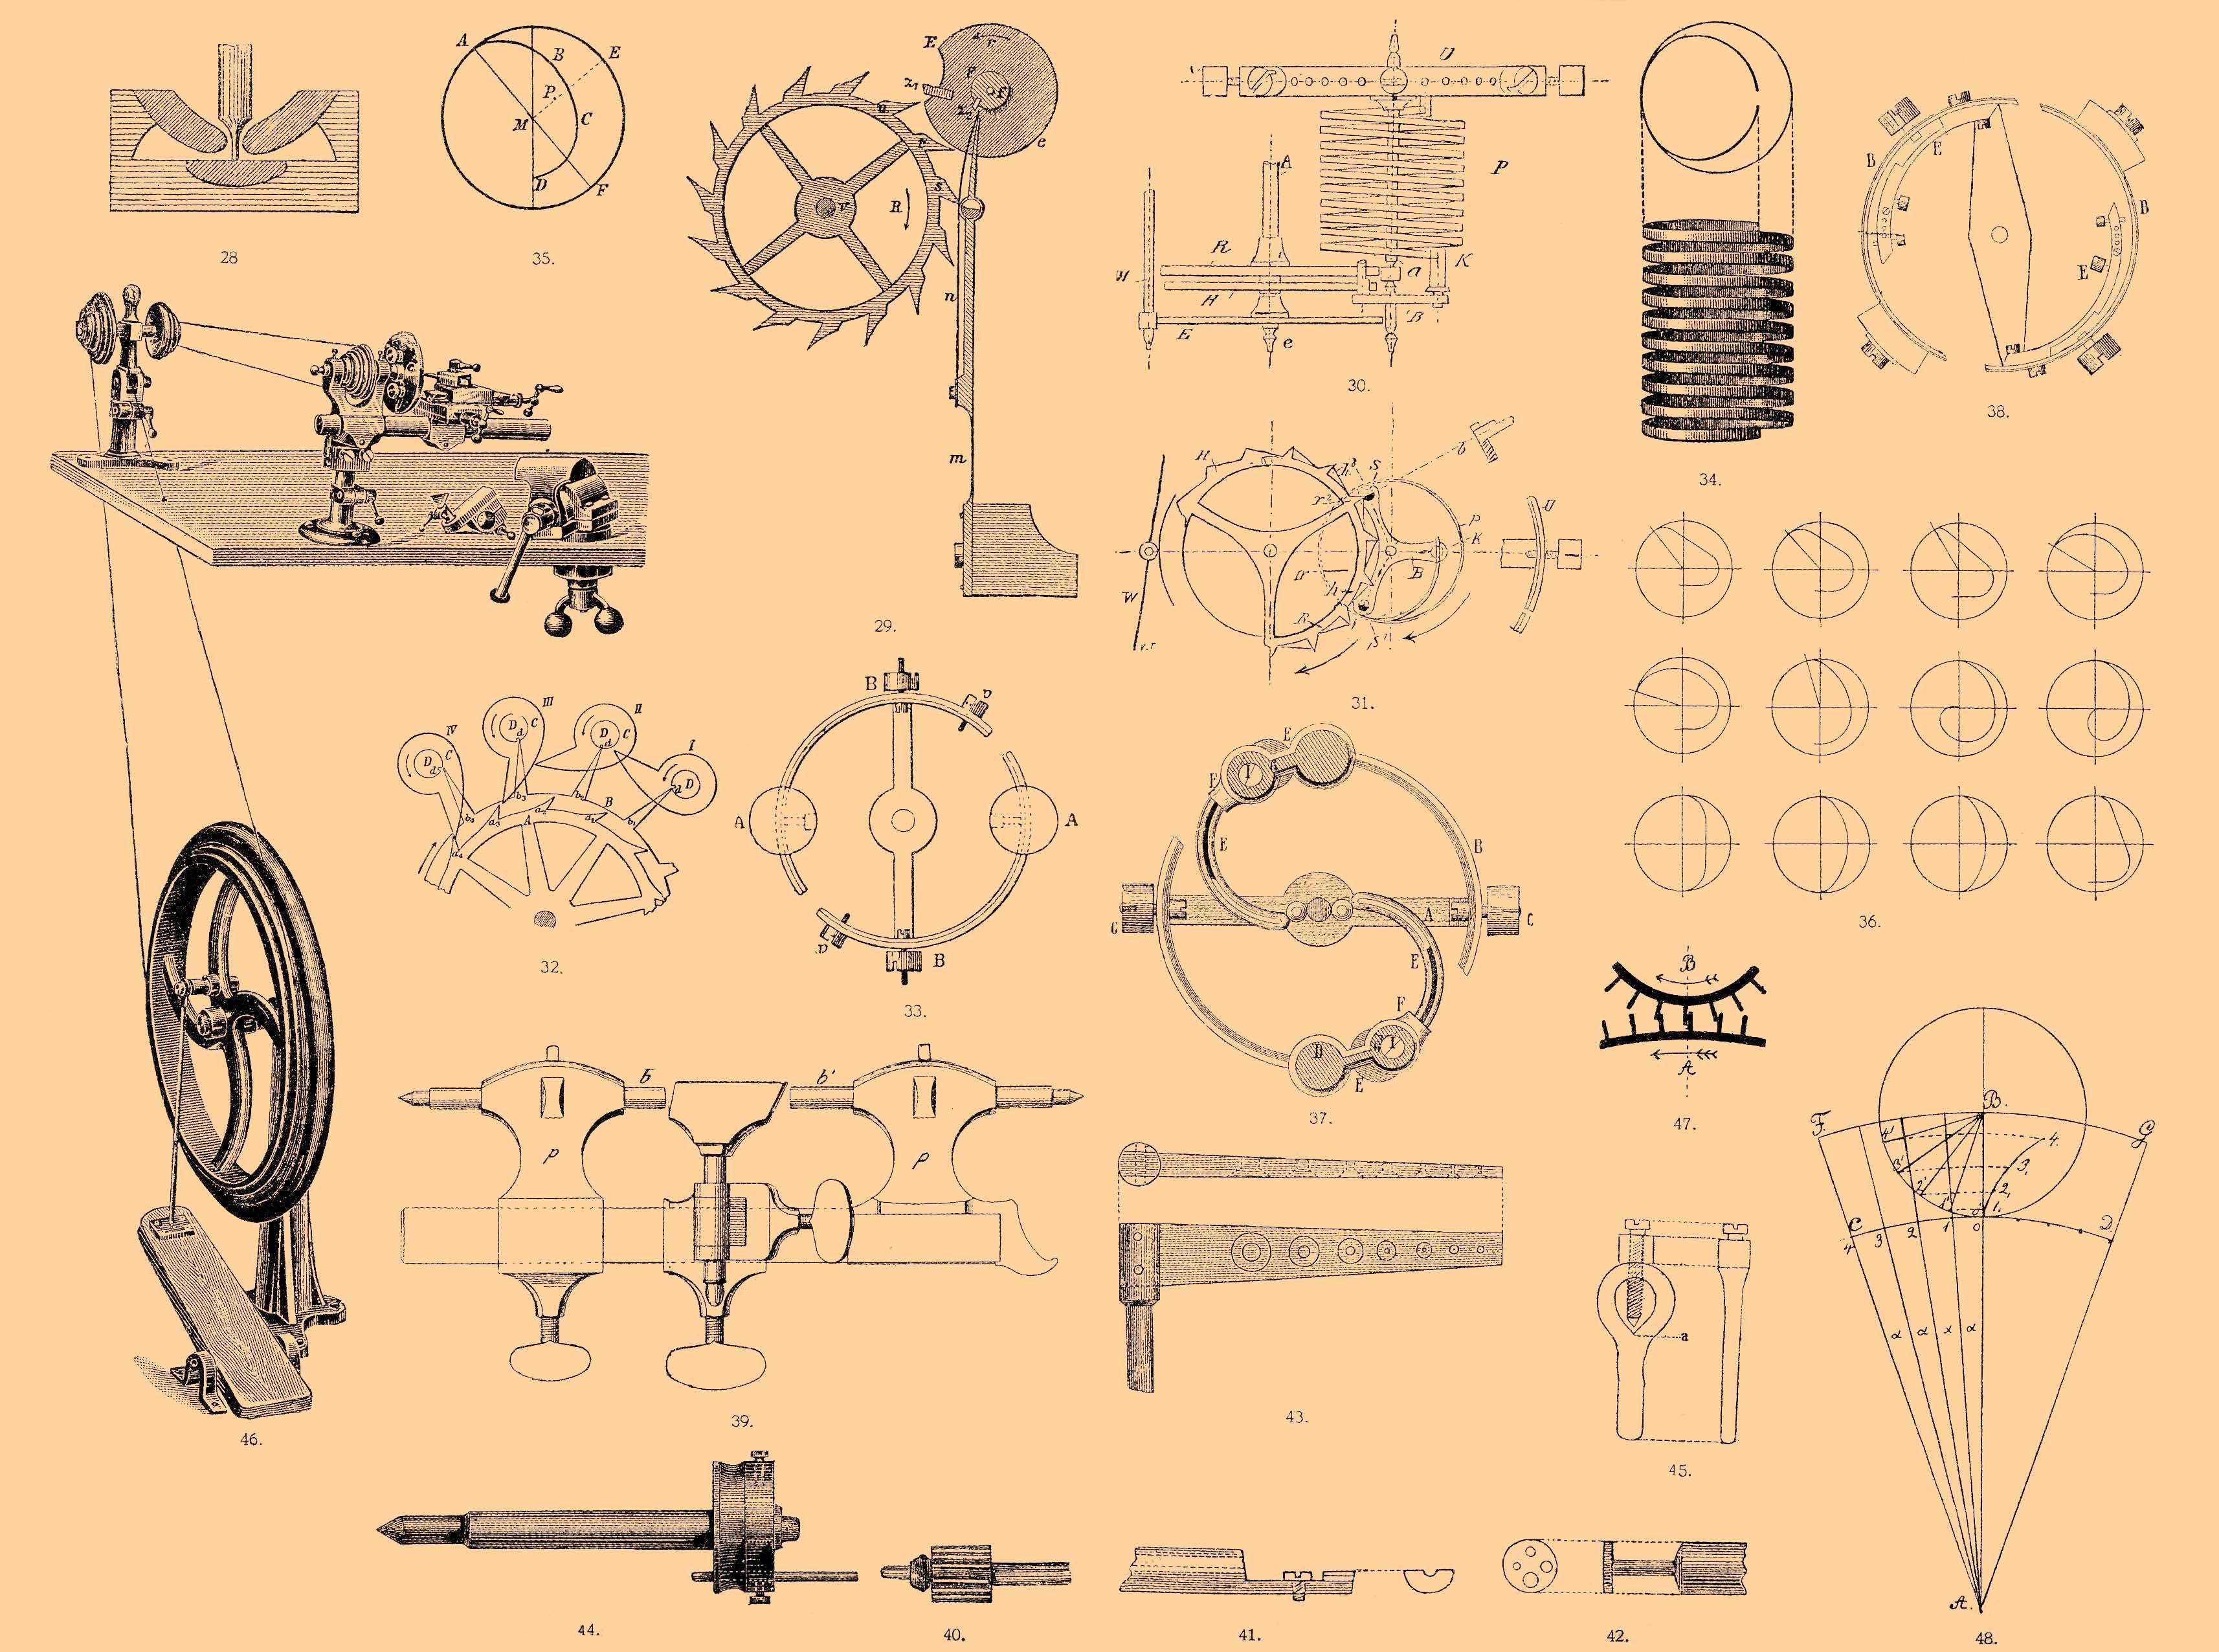 Brockhaus and Efron Encyclopedic Dictionary b75 438-3.jpg